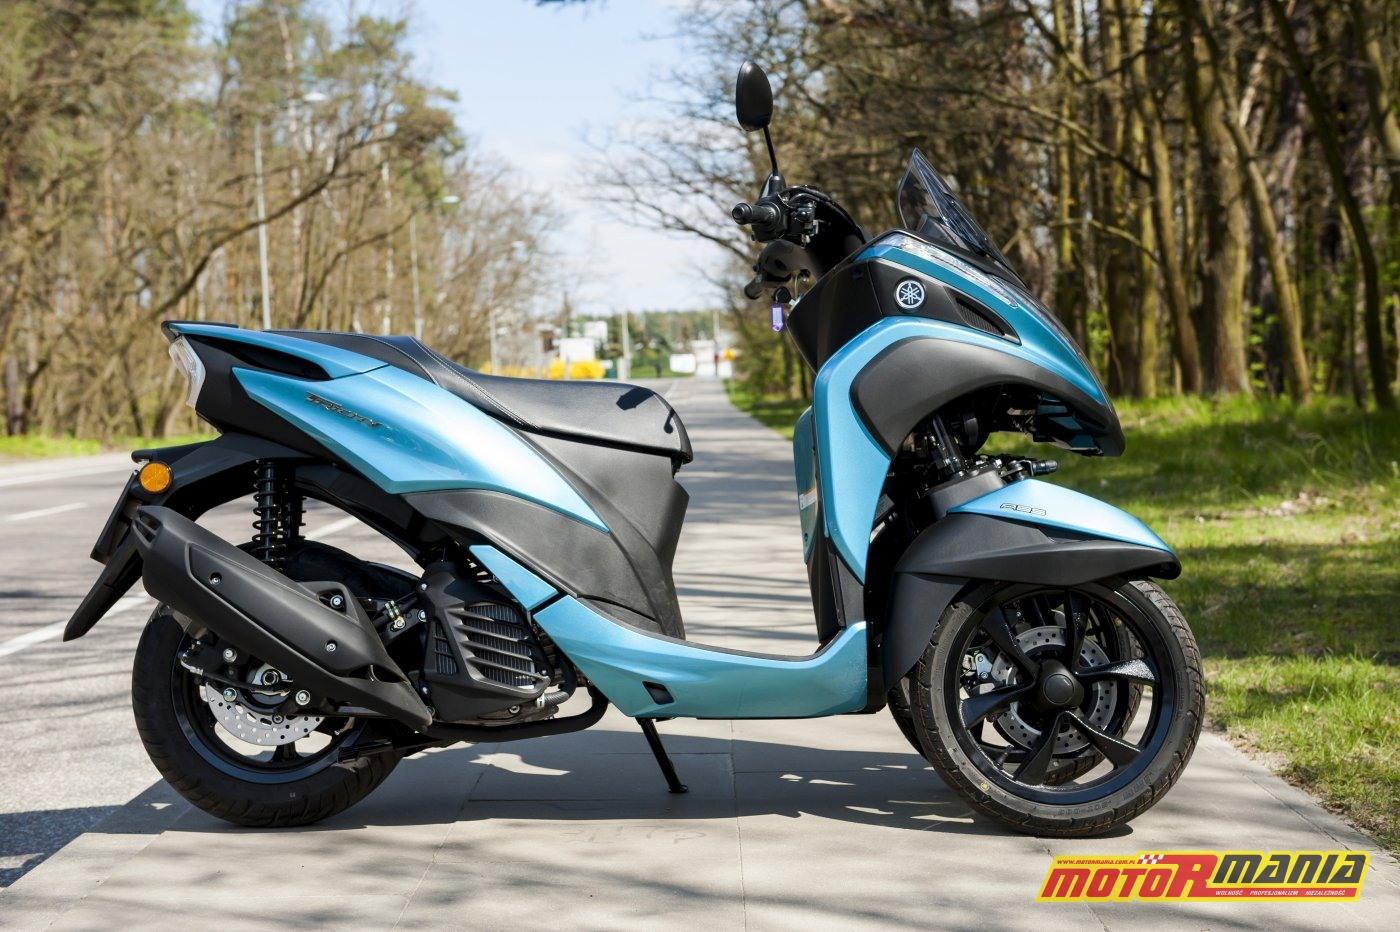 Yamaha Tricity 125 test motormania - fot Tomazi_pl (6)